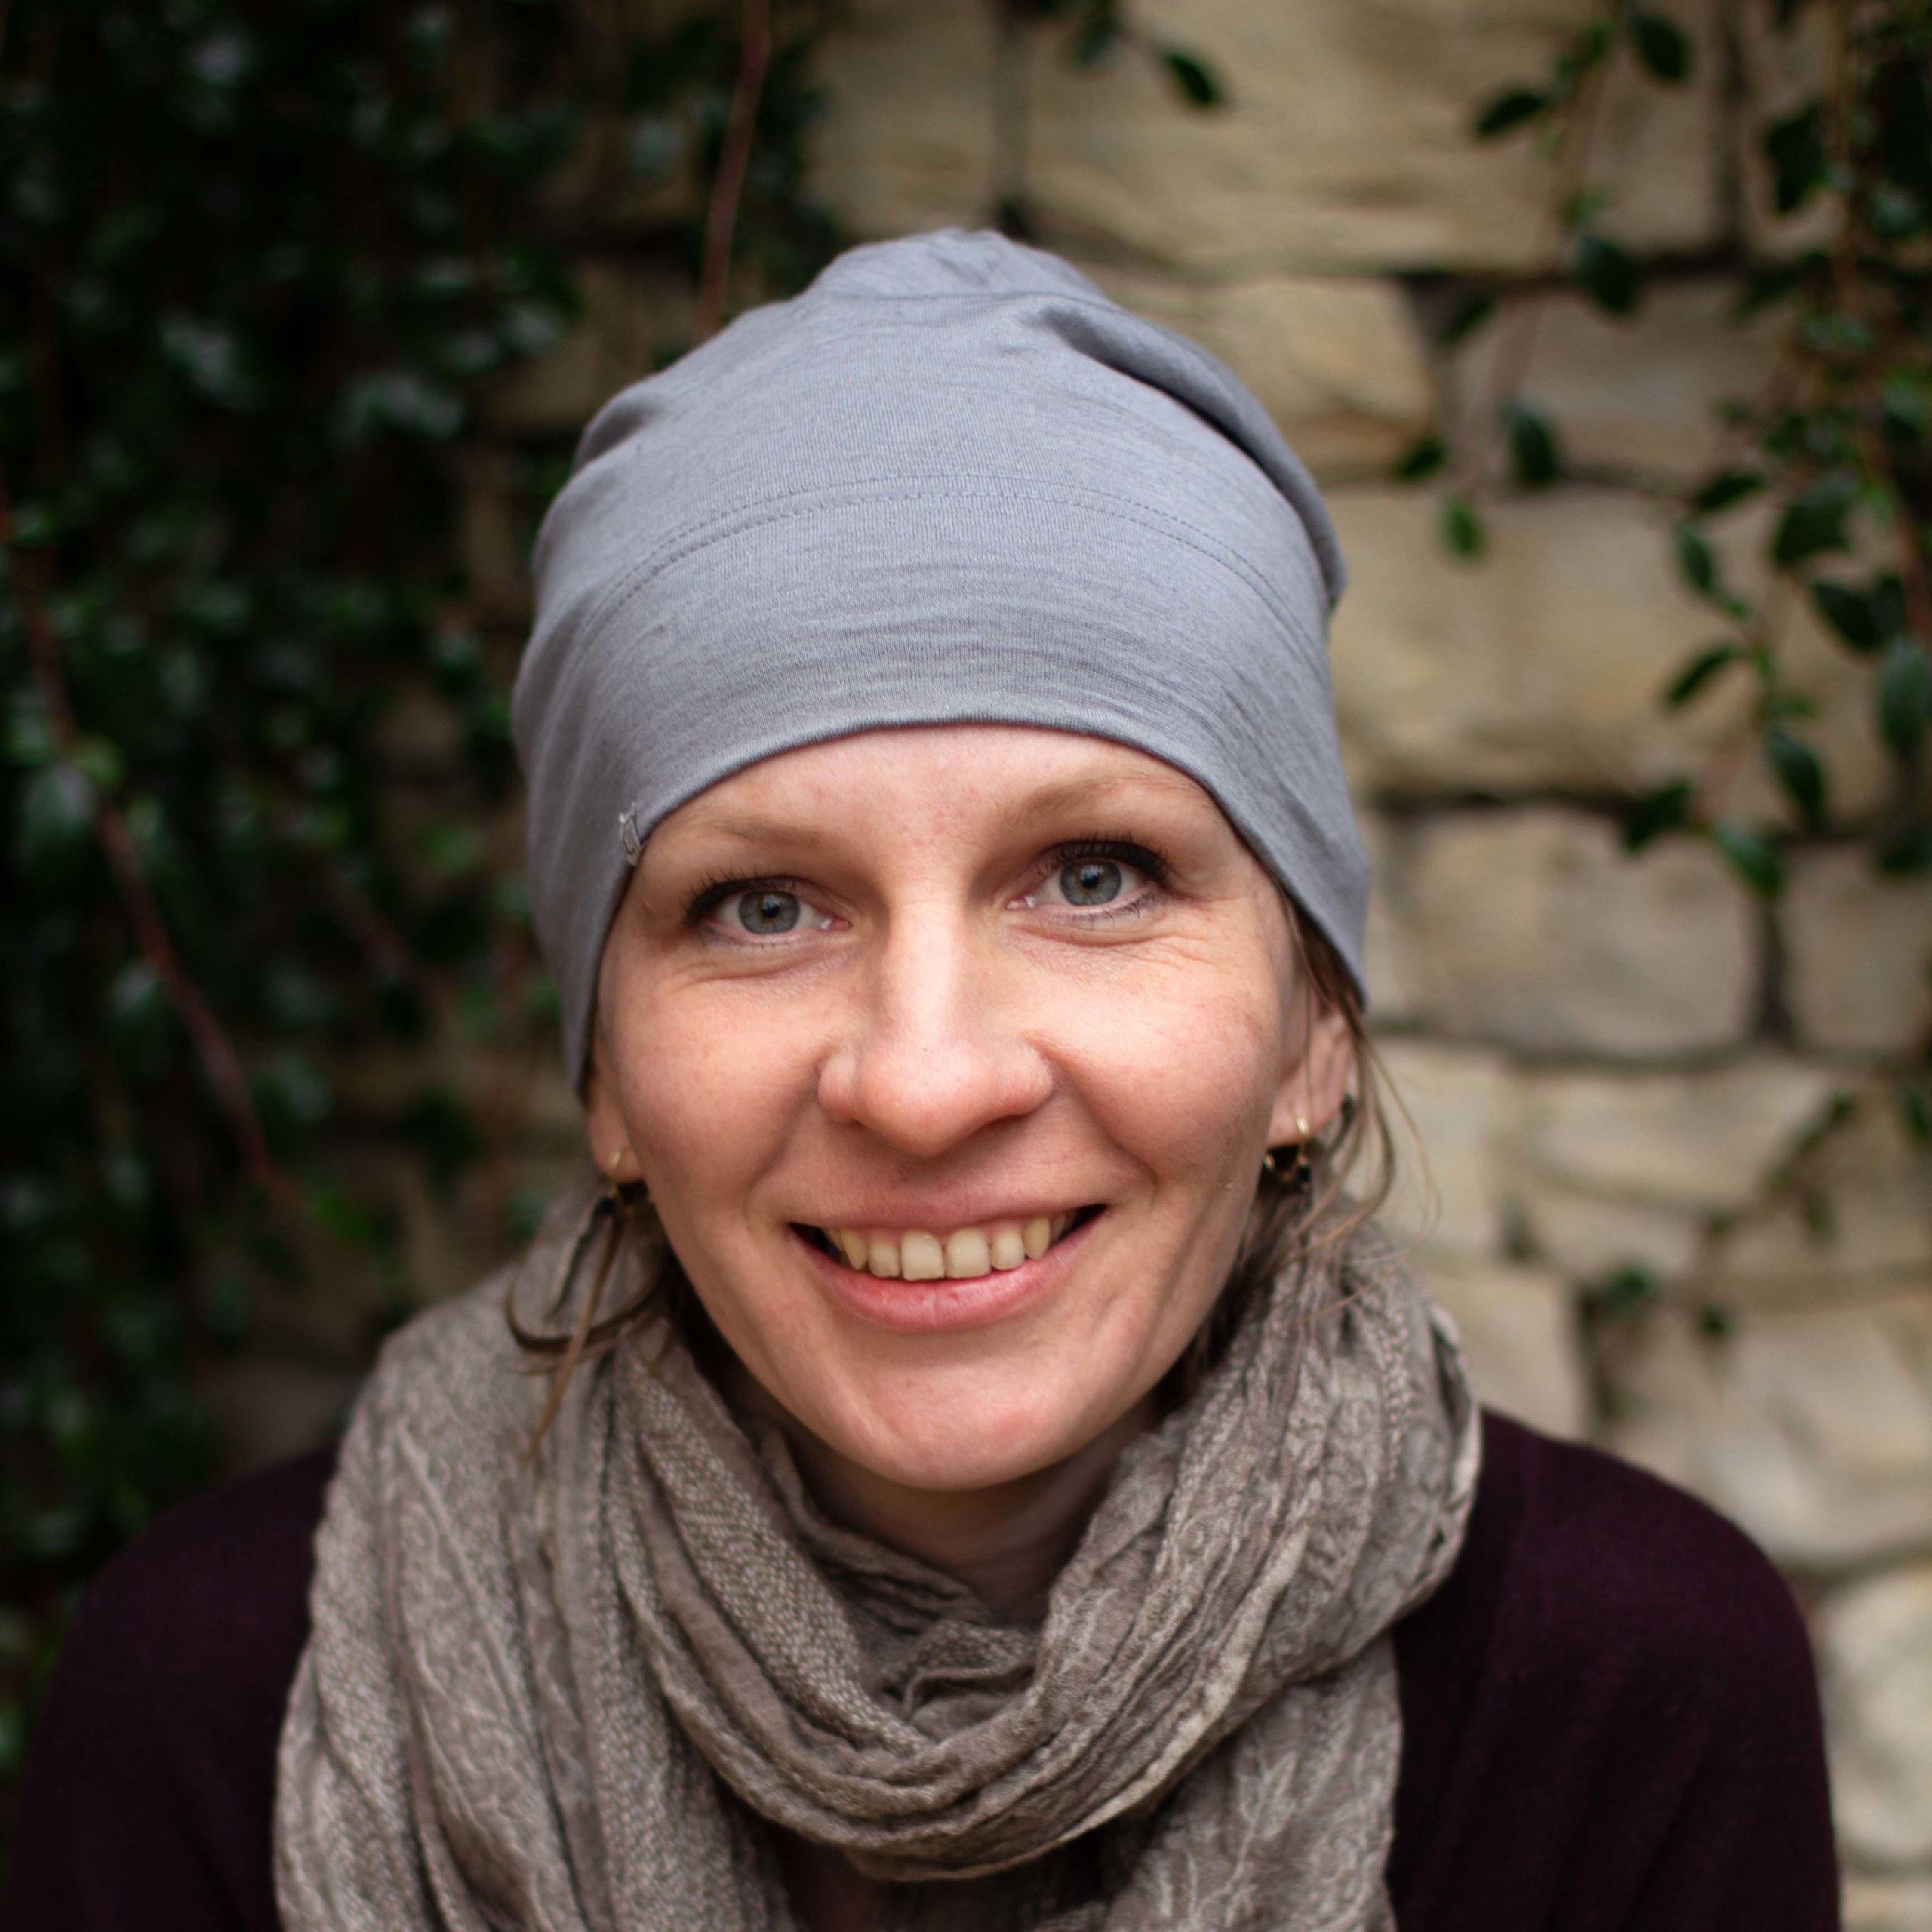 Zuzana jamrichova